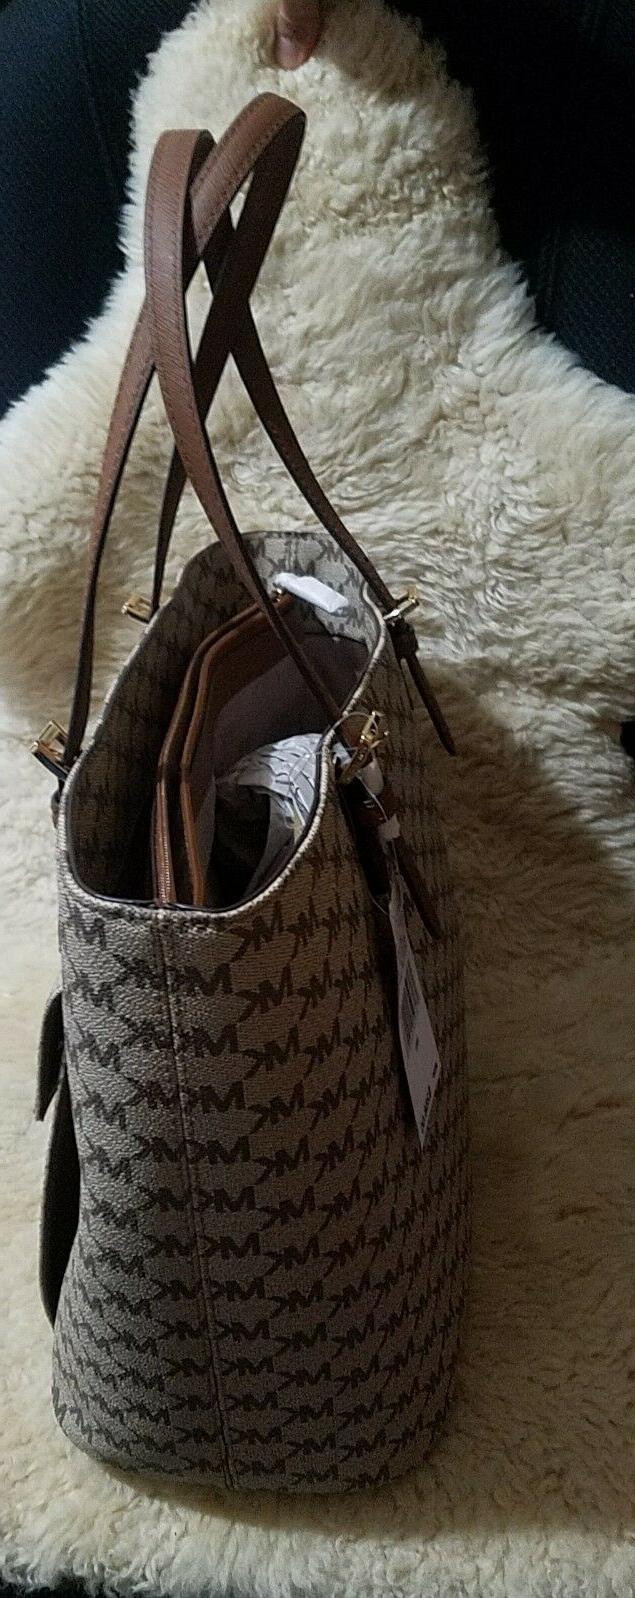 NWT Michael Kors Large Handbag Laptop Tablet Purse Bag$268